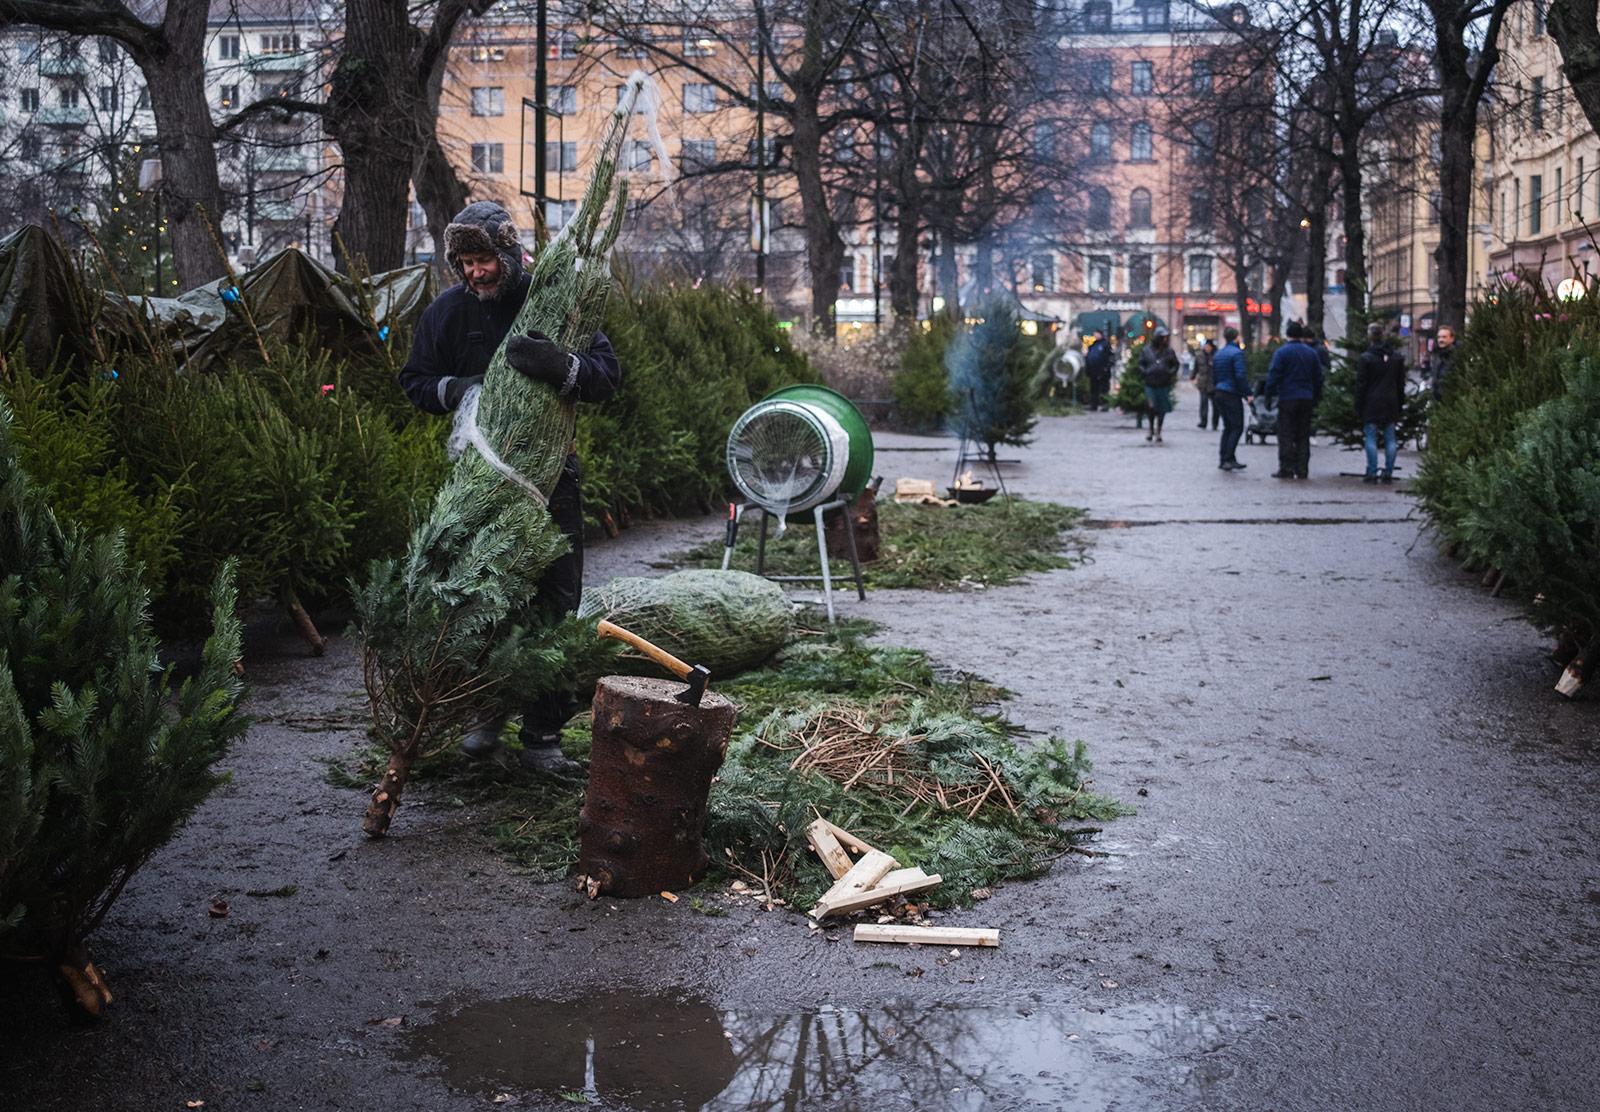 Man unwrapping Christmas tree